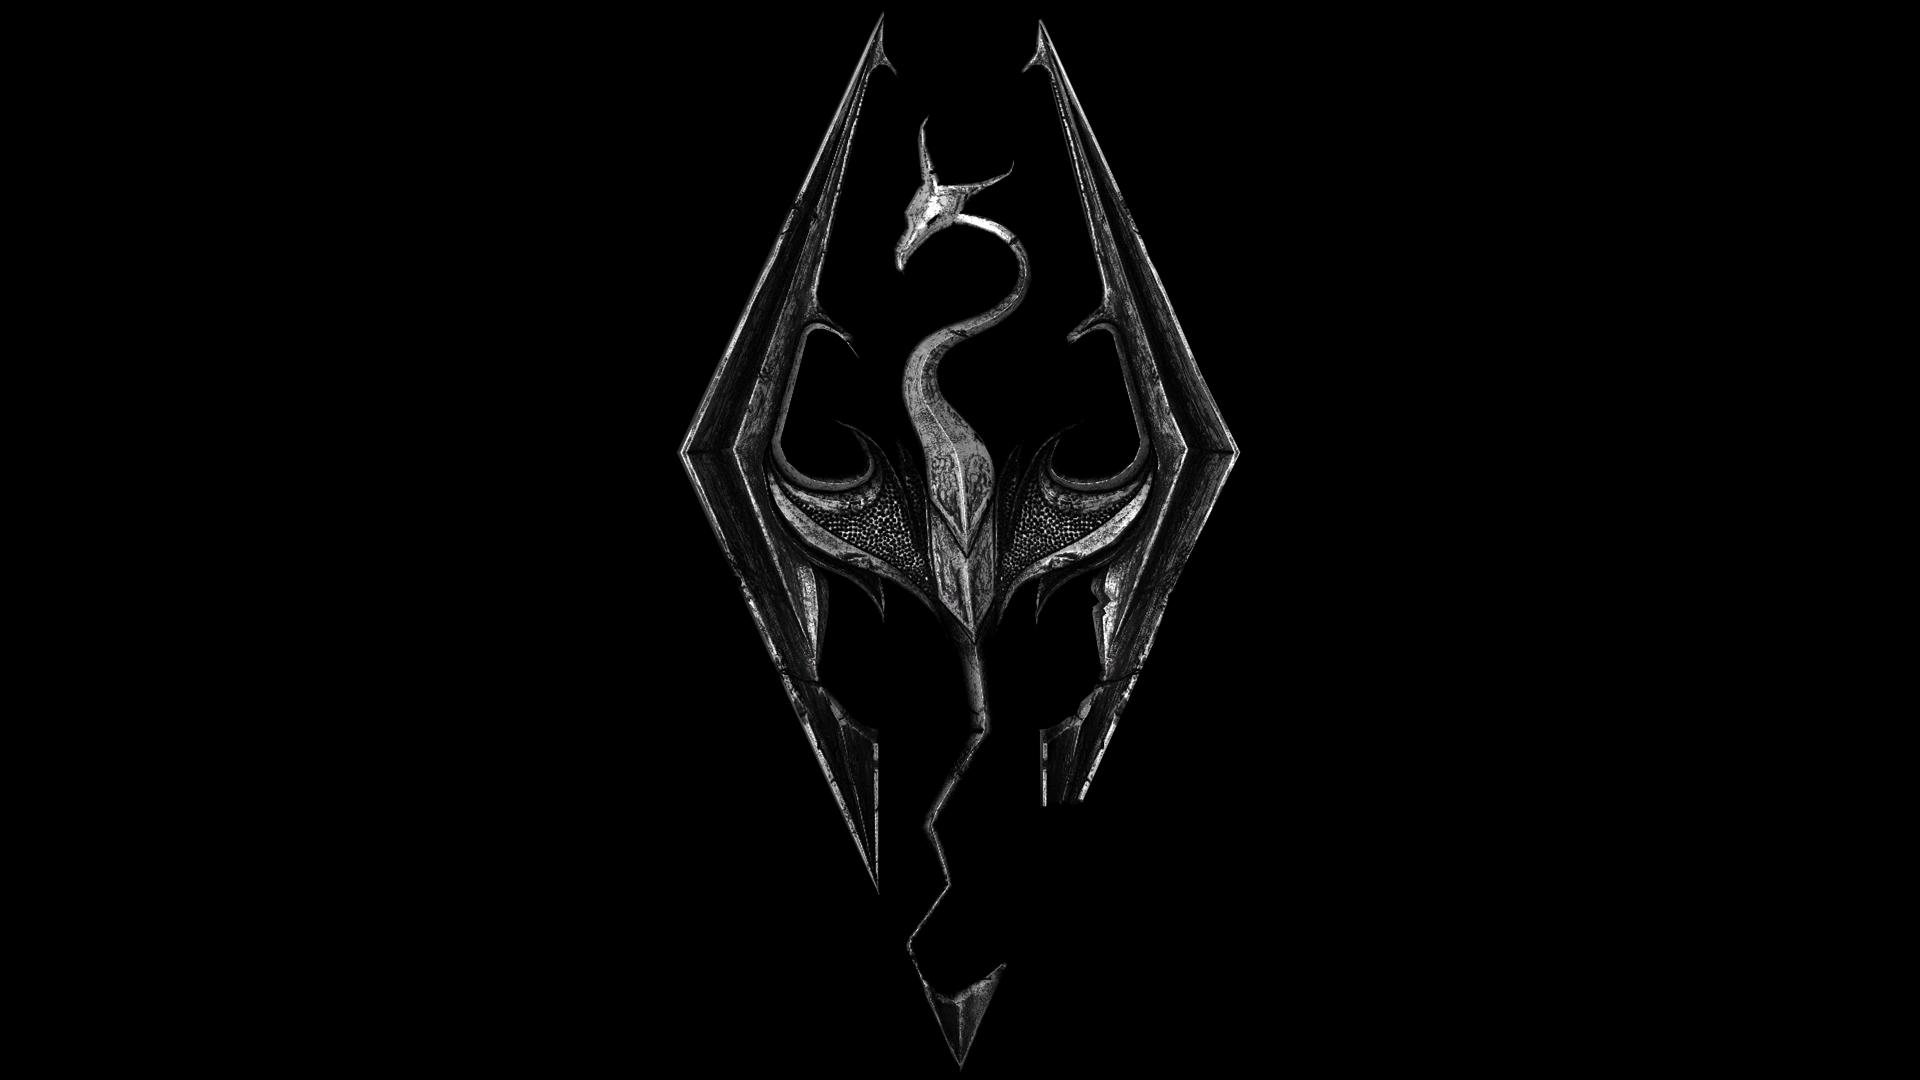 Skyrim emblem render hd logo 1080p games 1024x768